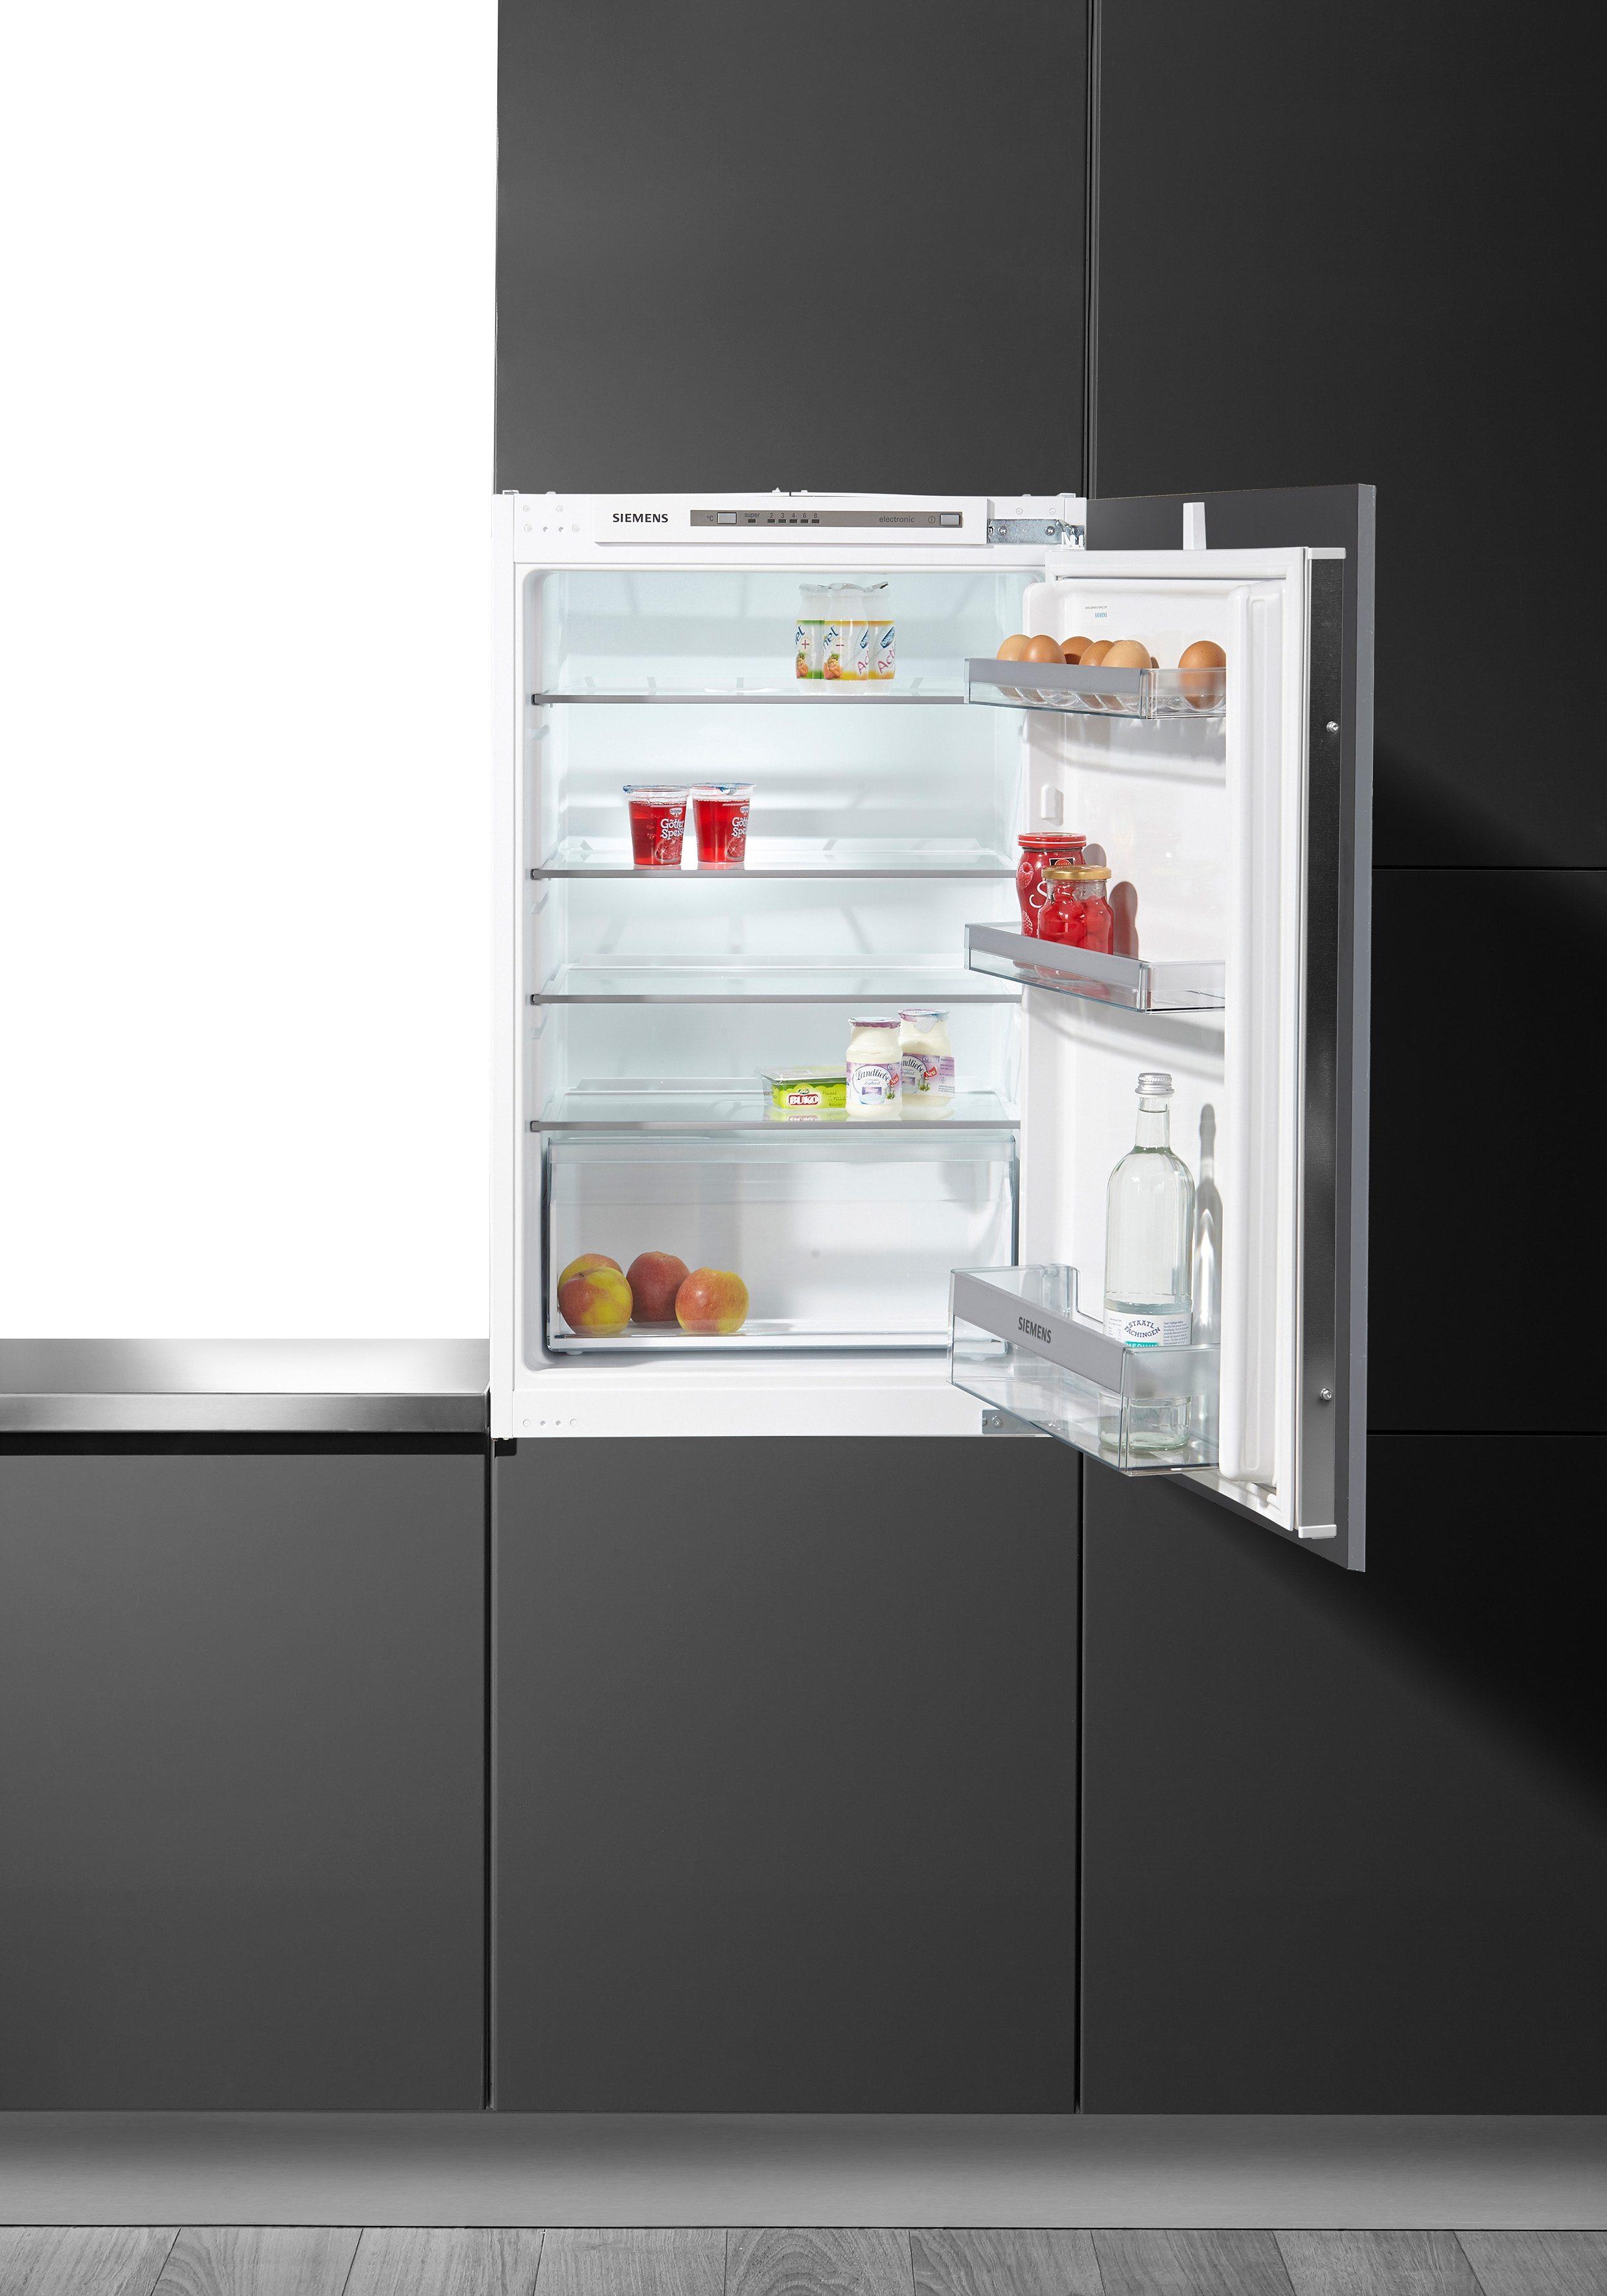 Siemens Einbau-Kühlautomat KI21RVF30, A++, 87,4 cm hoch